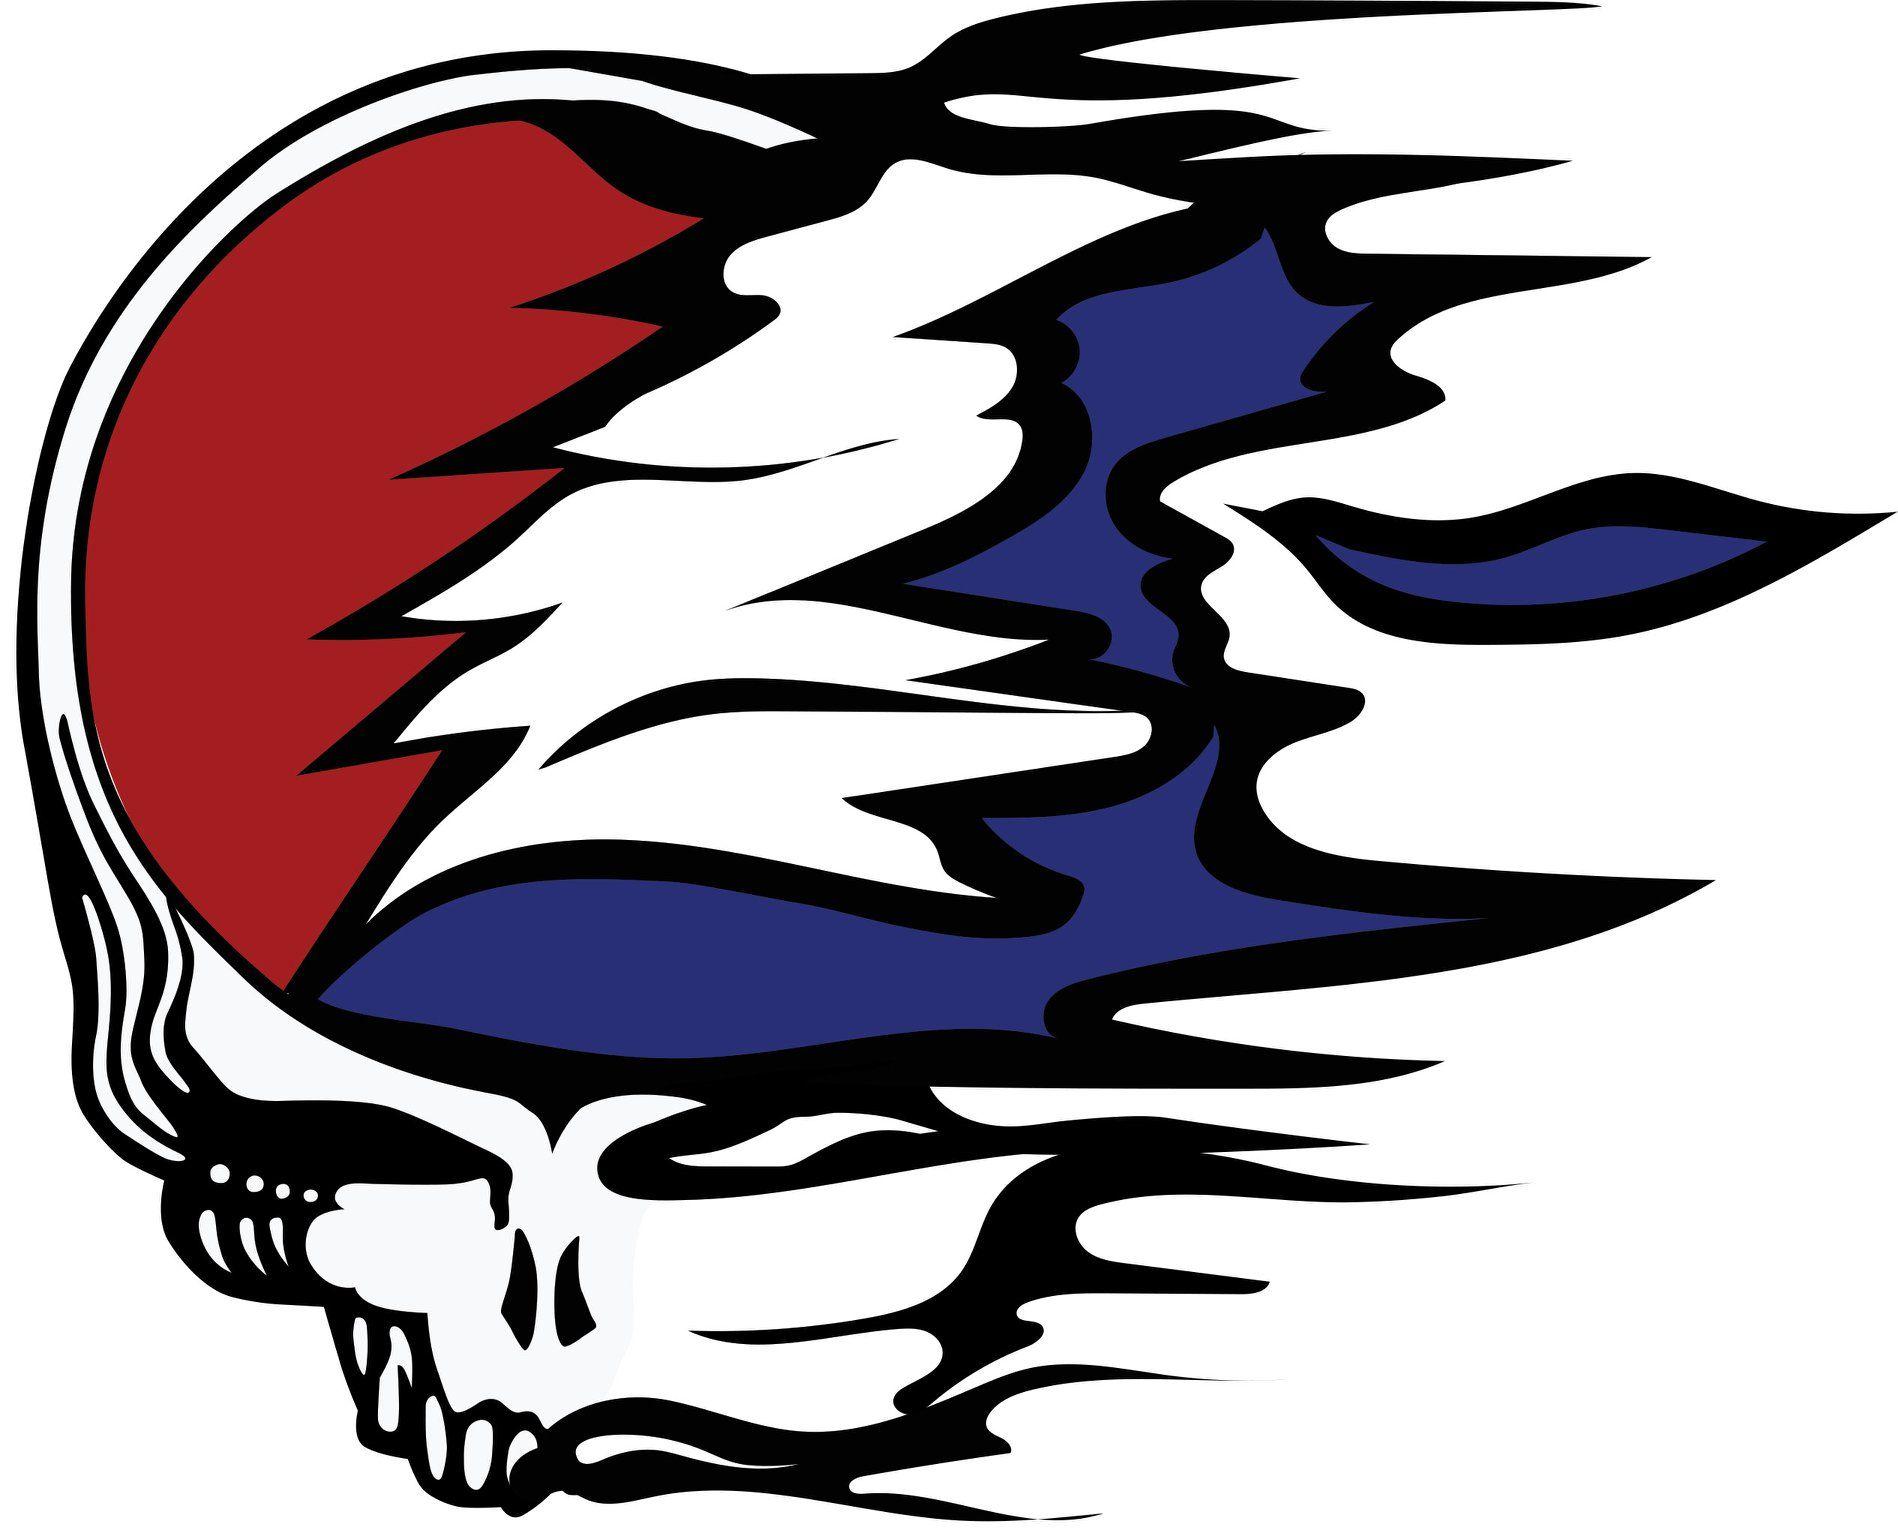 Syf The Grateful Dead Grateful Dead Shows Grateful Dead